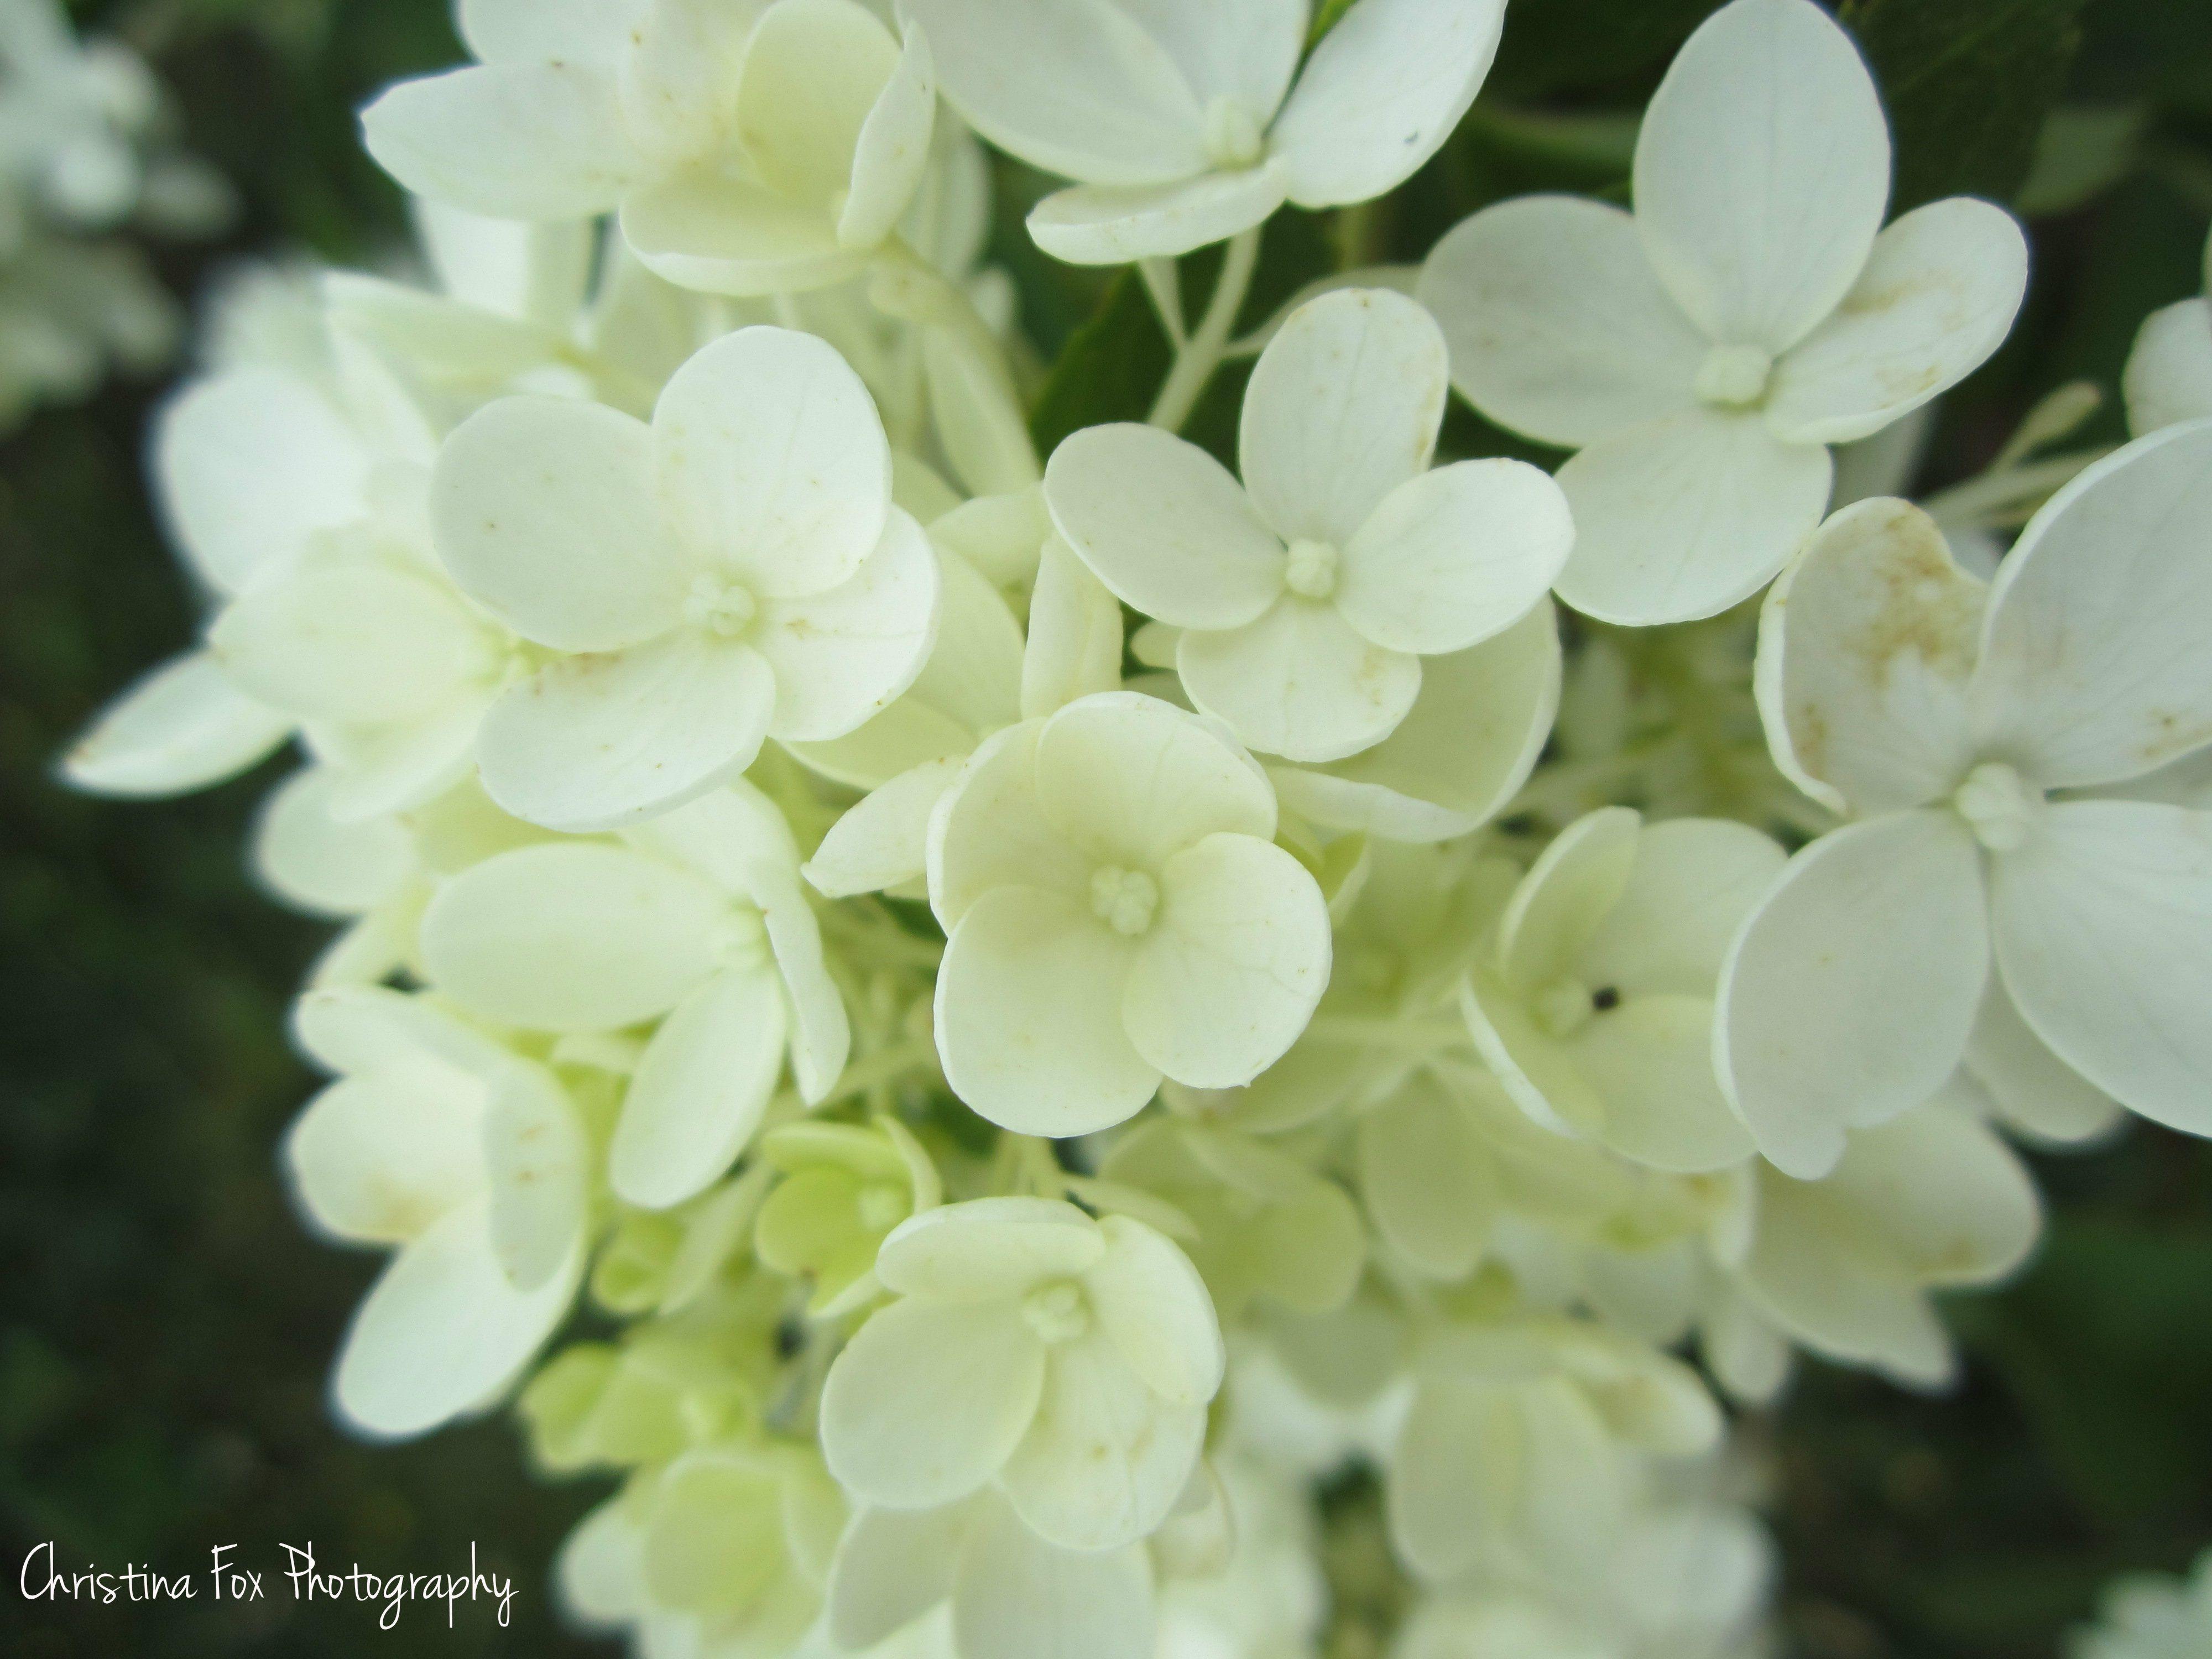 https://www.facebook.com/photo.php?fbid=426633404054498=a.367300473321125.102912.184808384903669=3